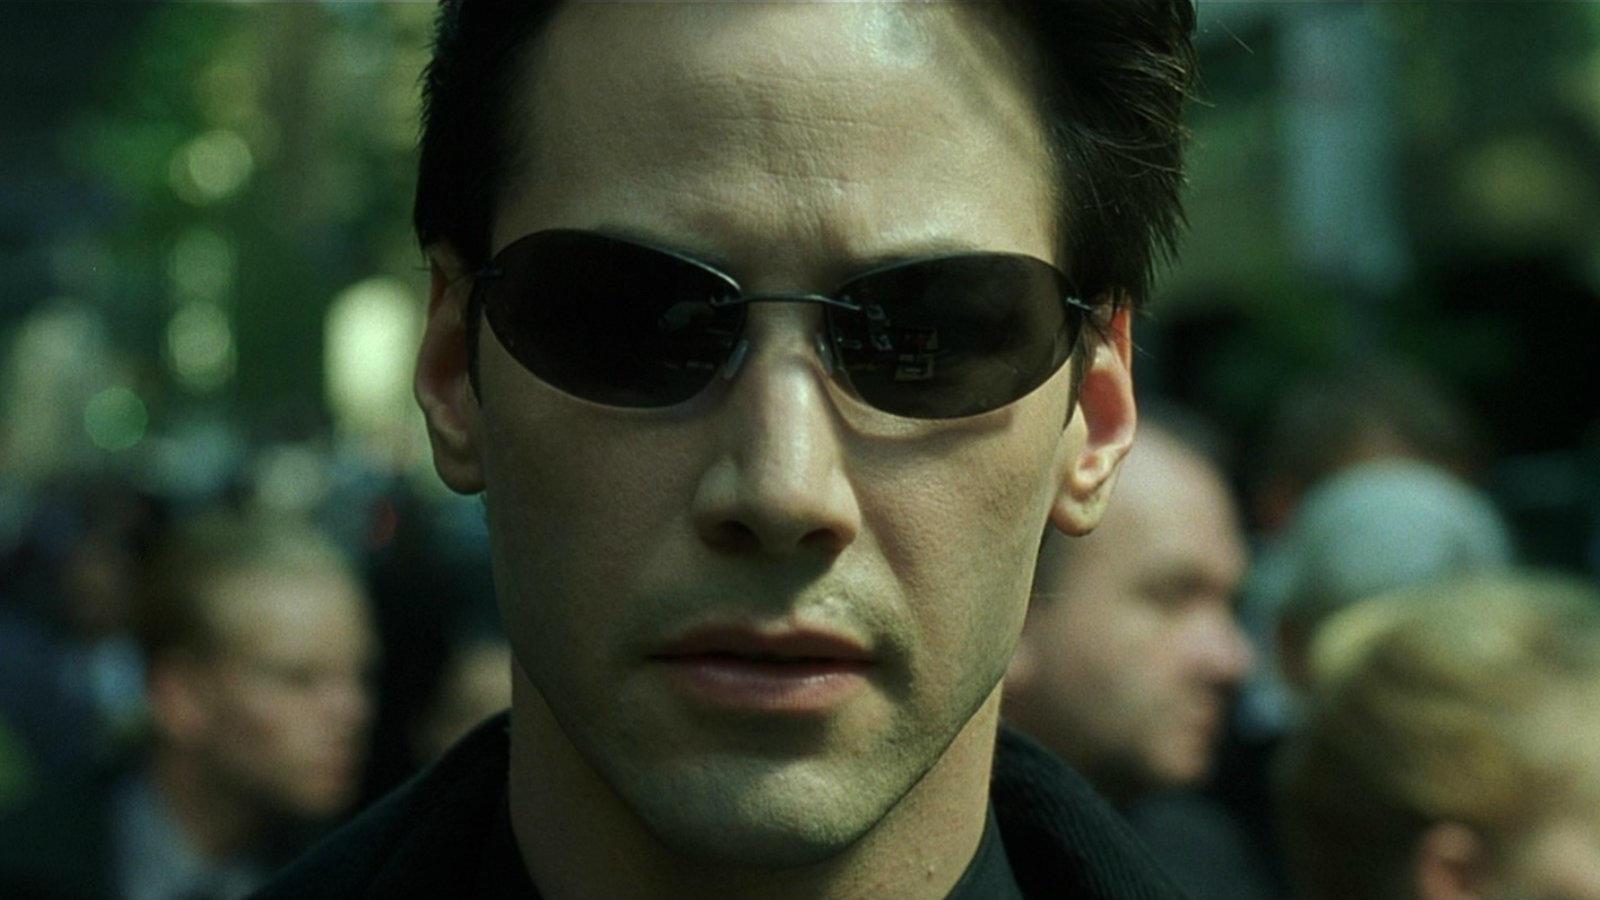 569af04a9f the Matrix sequels are actually genius